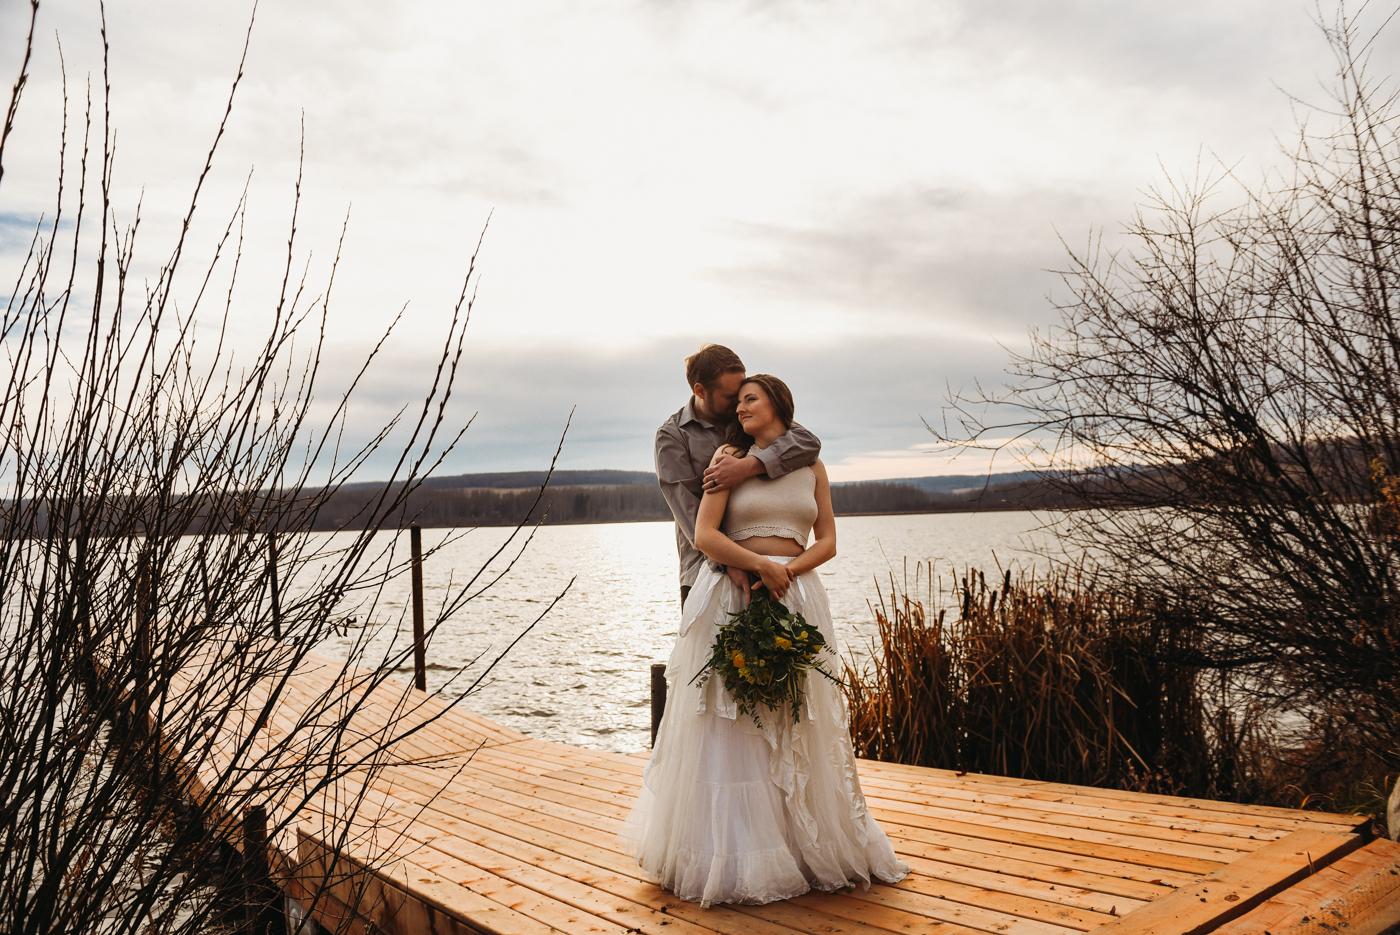 FortSt.John_photographer_TyraEPhotography_Wedding_Couple_Family_Photograhy_DawsonCreek_Elopement_Bride_Boduoir_Portraits-18.jpg